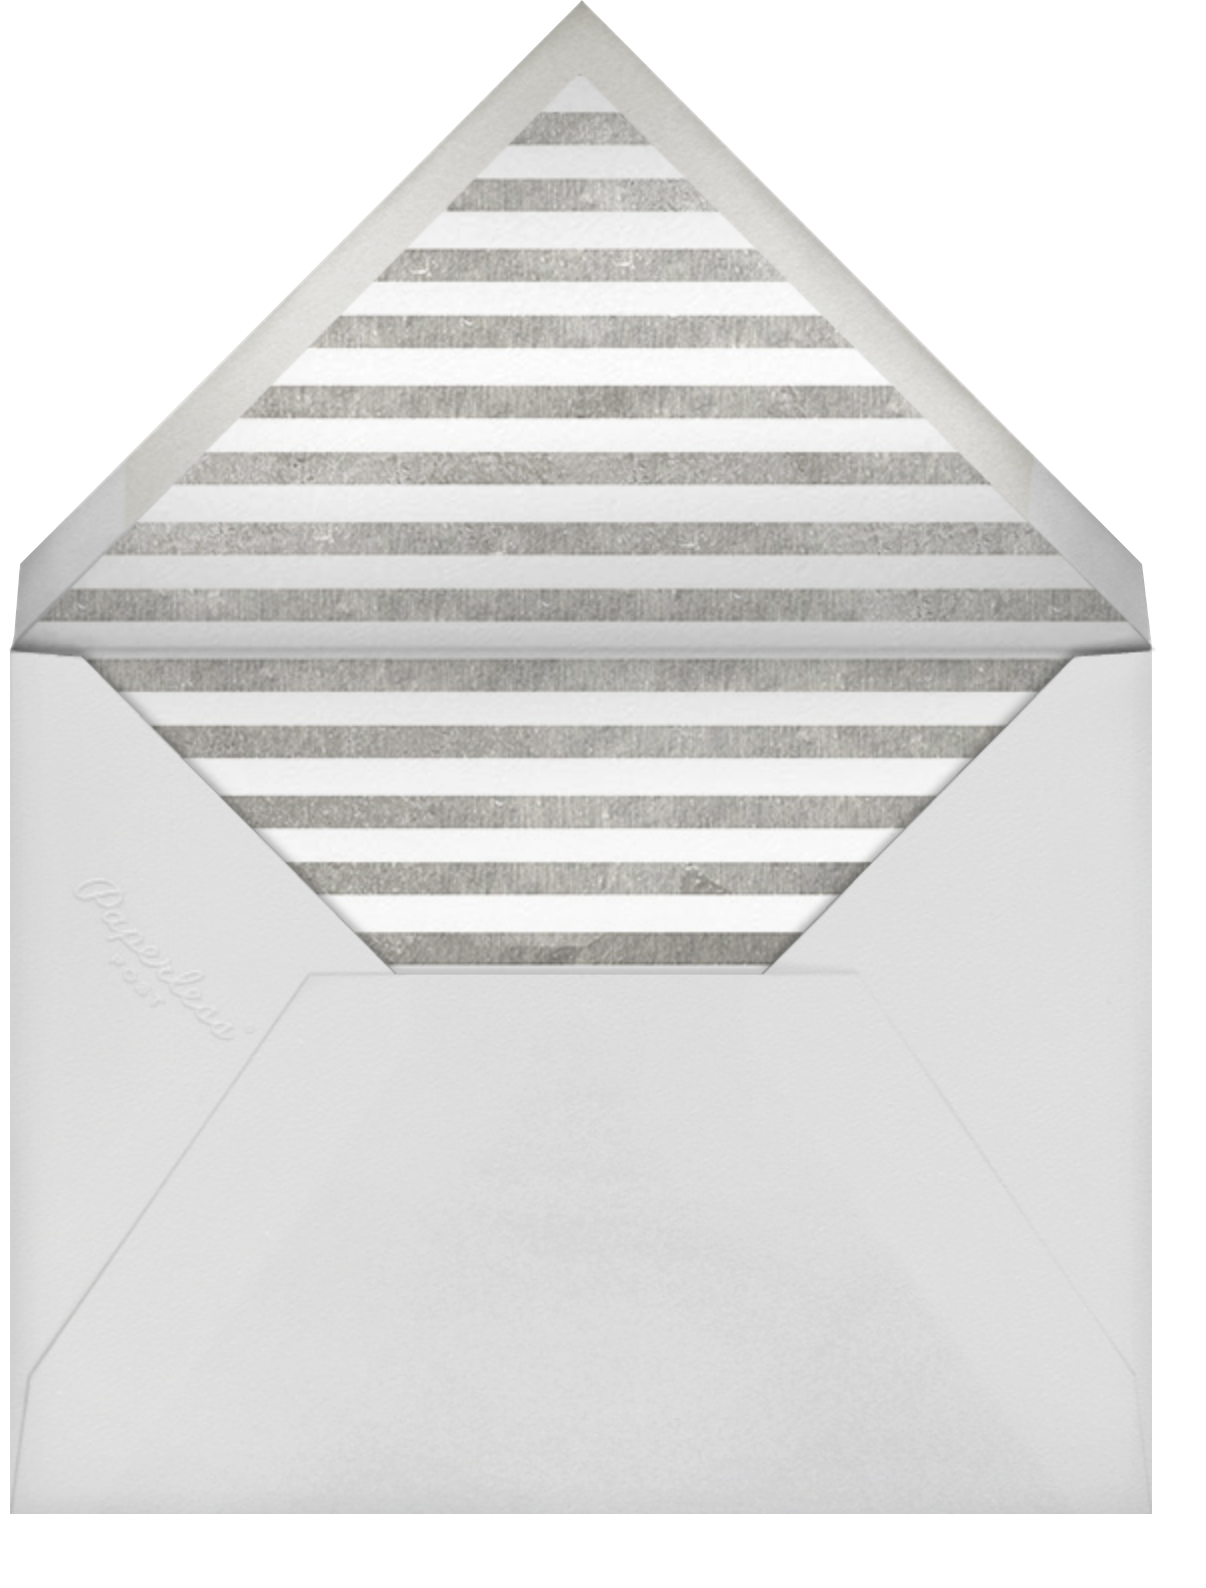 Saint-Preux (Photo) - Black/Silver - Paperless Post - Envelope